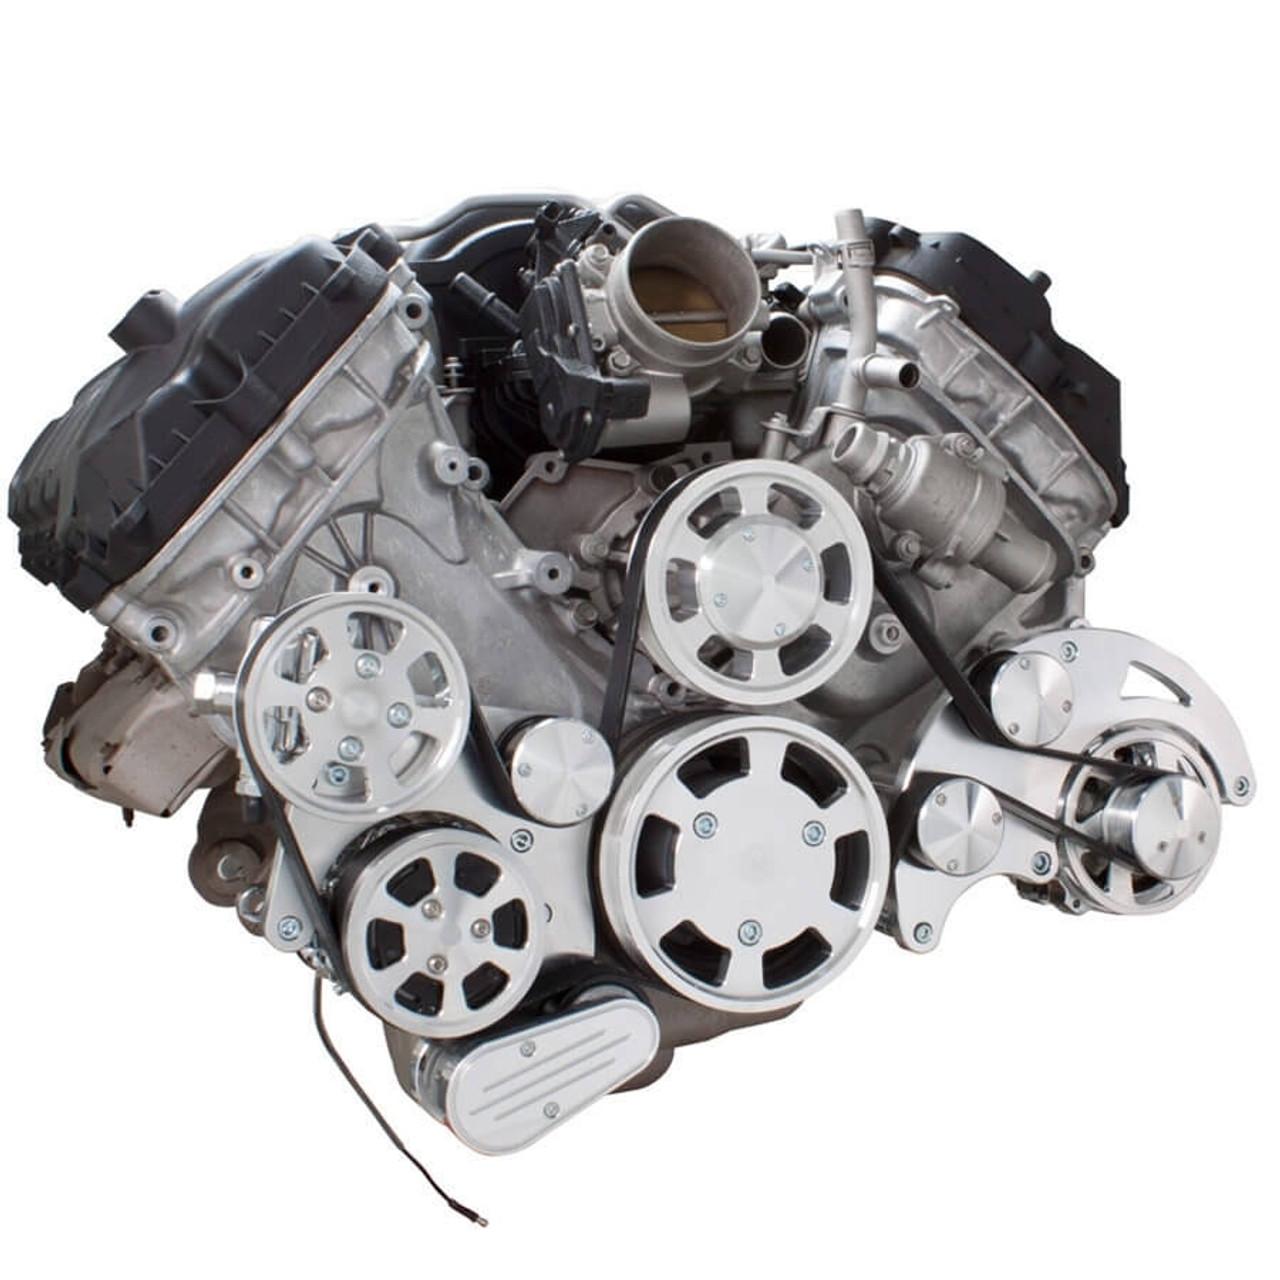 medium resolution of  serpentine system for ford coyote 5 0 ac power steering alternator